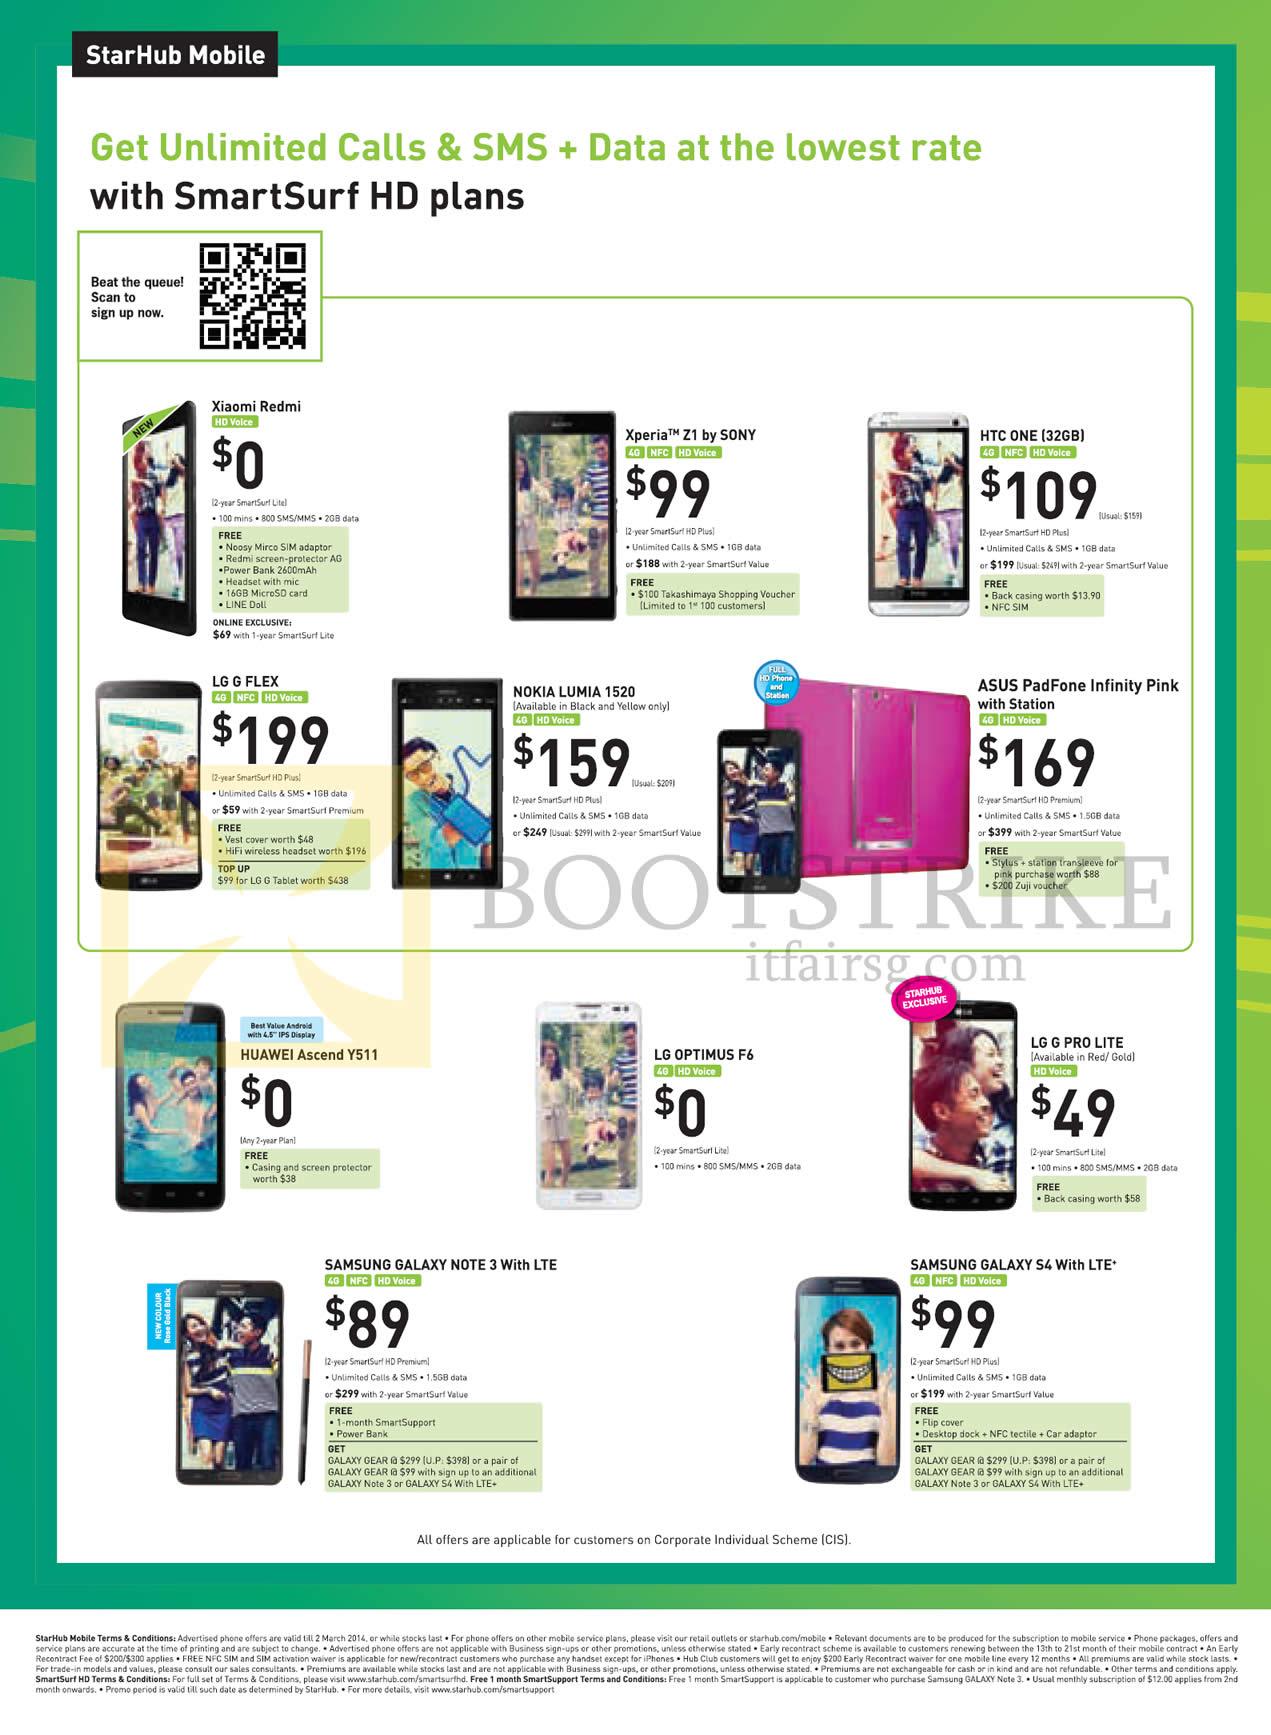 Mobile Xiaomi Redmi Sony Xperia Z1 Htc One Lg G Flex Nokia Lumia Voucher 3 1gb 1520 Asus Padfone Infinity Huawei Ascend Y511 Optimus F6 Pro Lite Samsung Galaxy Note S4